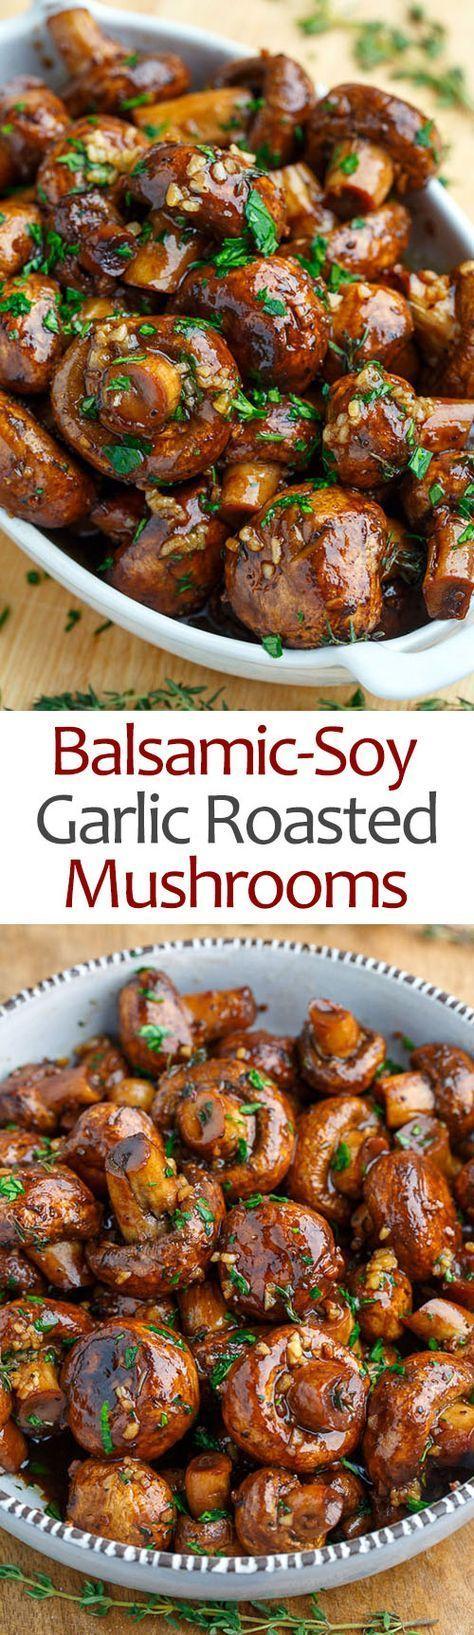 Balsamic Soy Roasted Garlic Mushrooms 2 SP per serving (based on nutrition info)